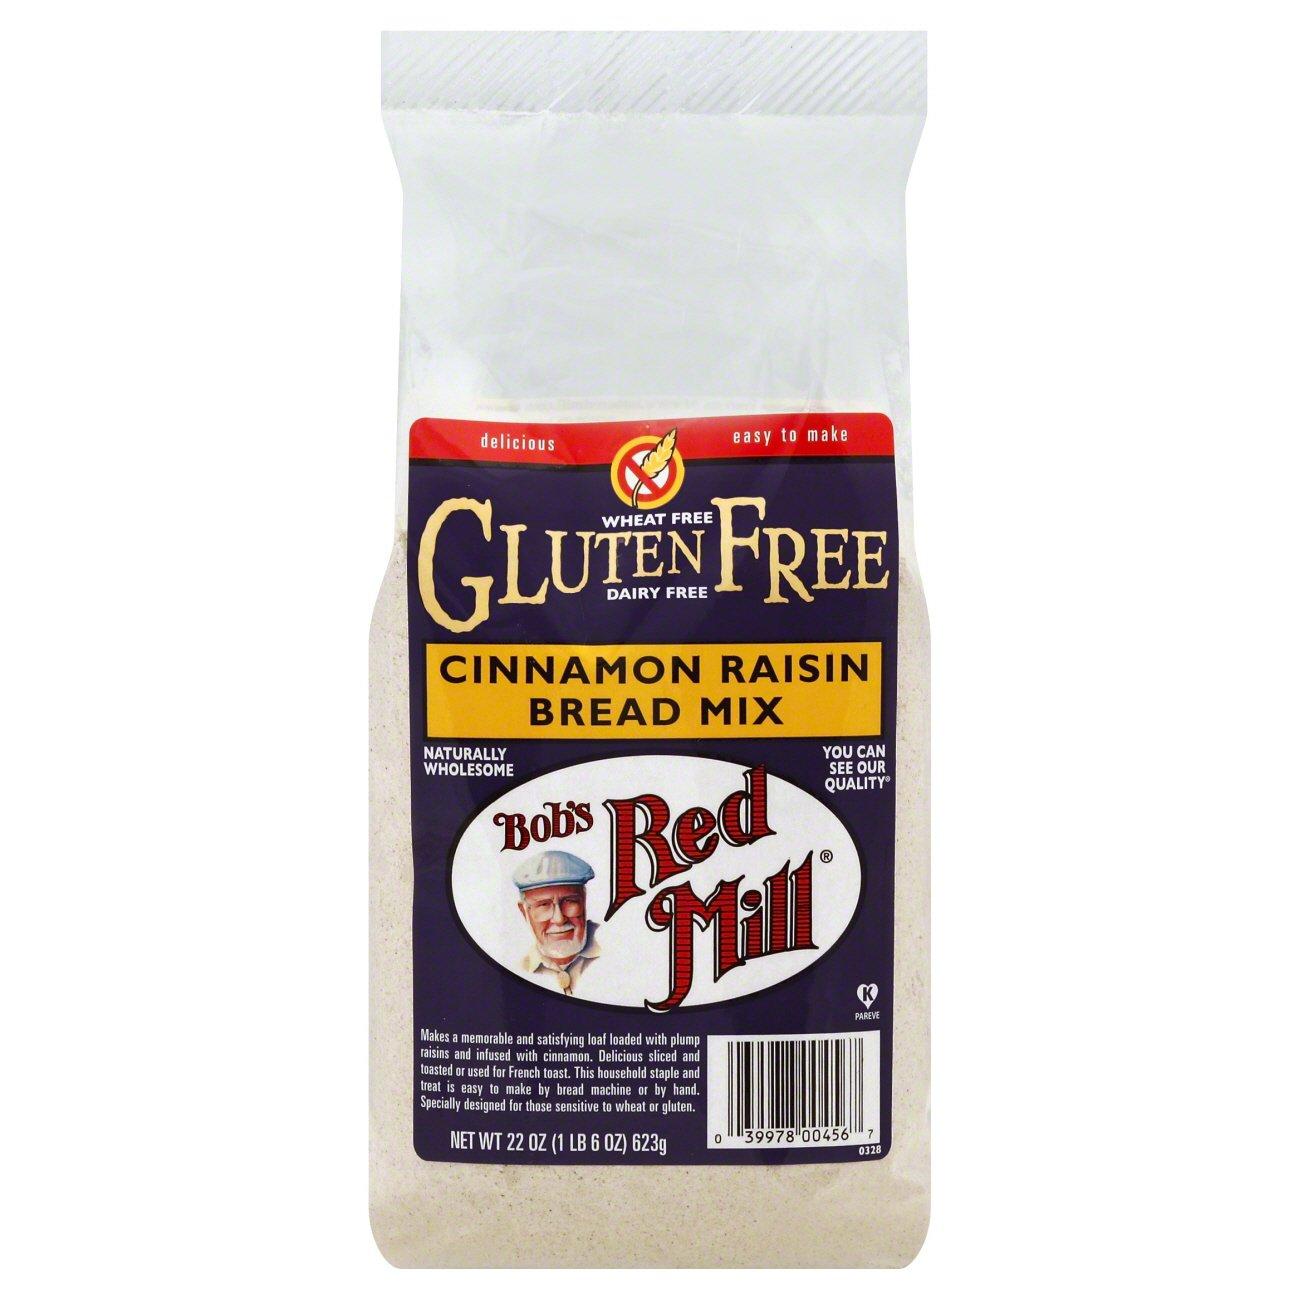 Bob's Red Mill Gluten Free Cinnamon Raisin Bread Mix ...